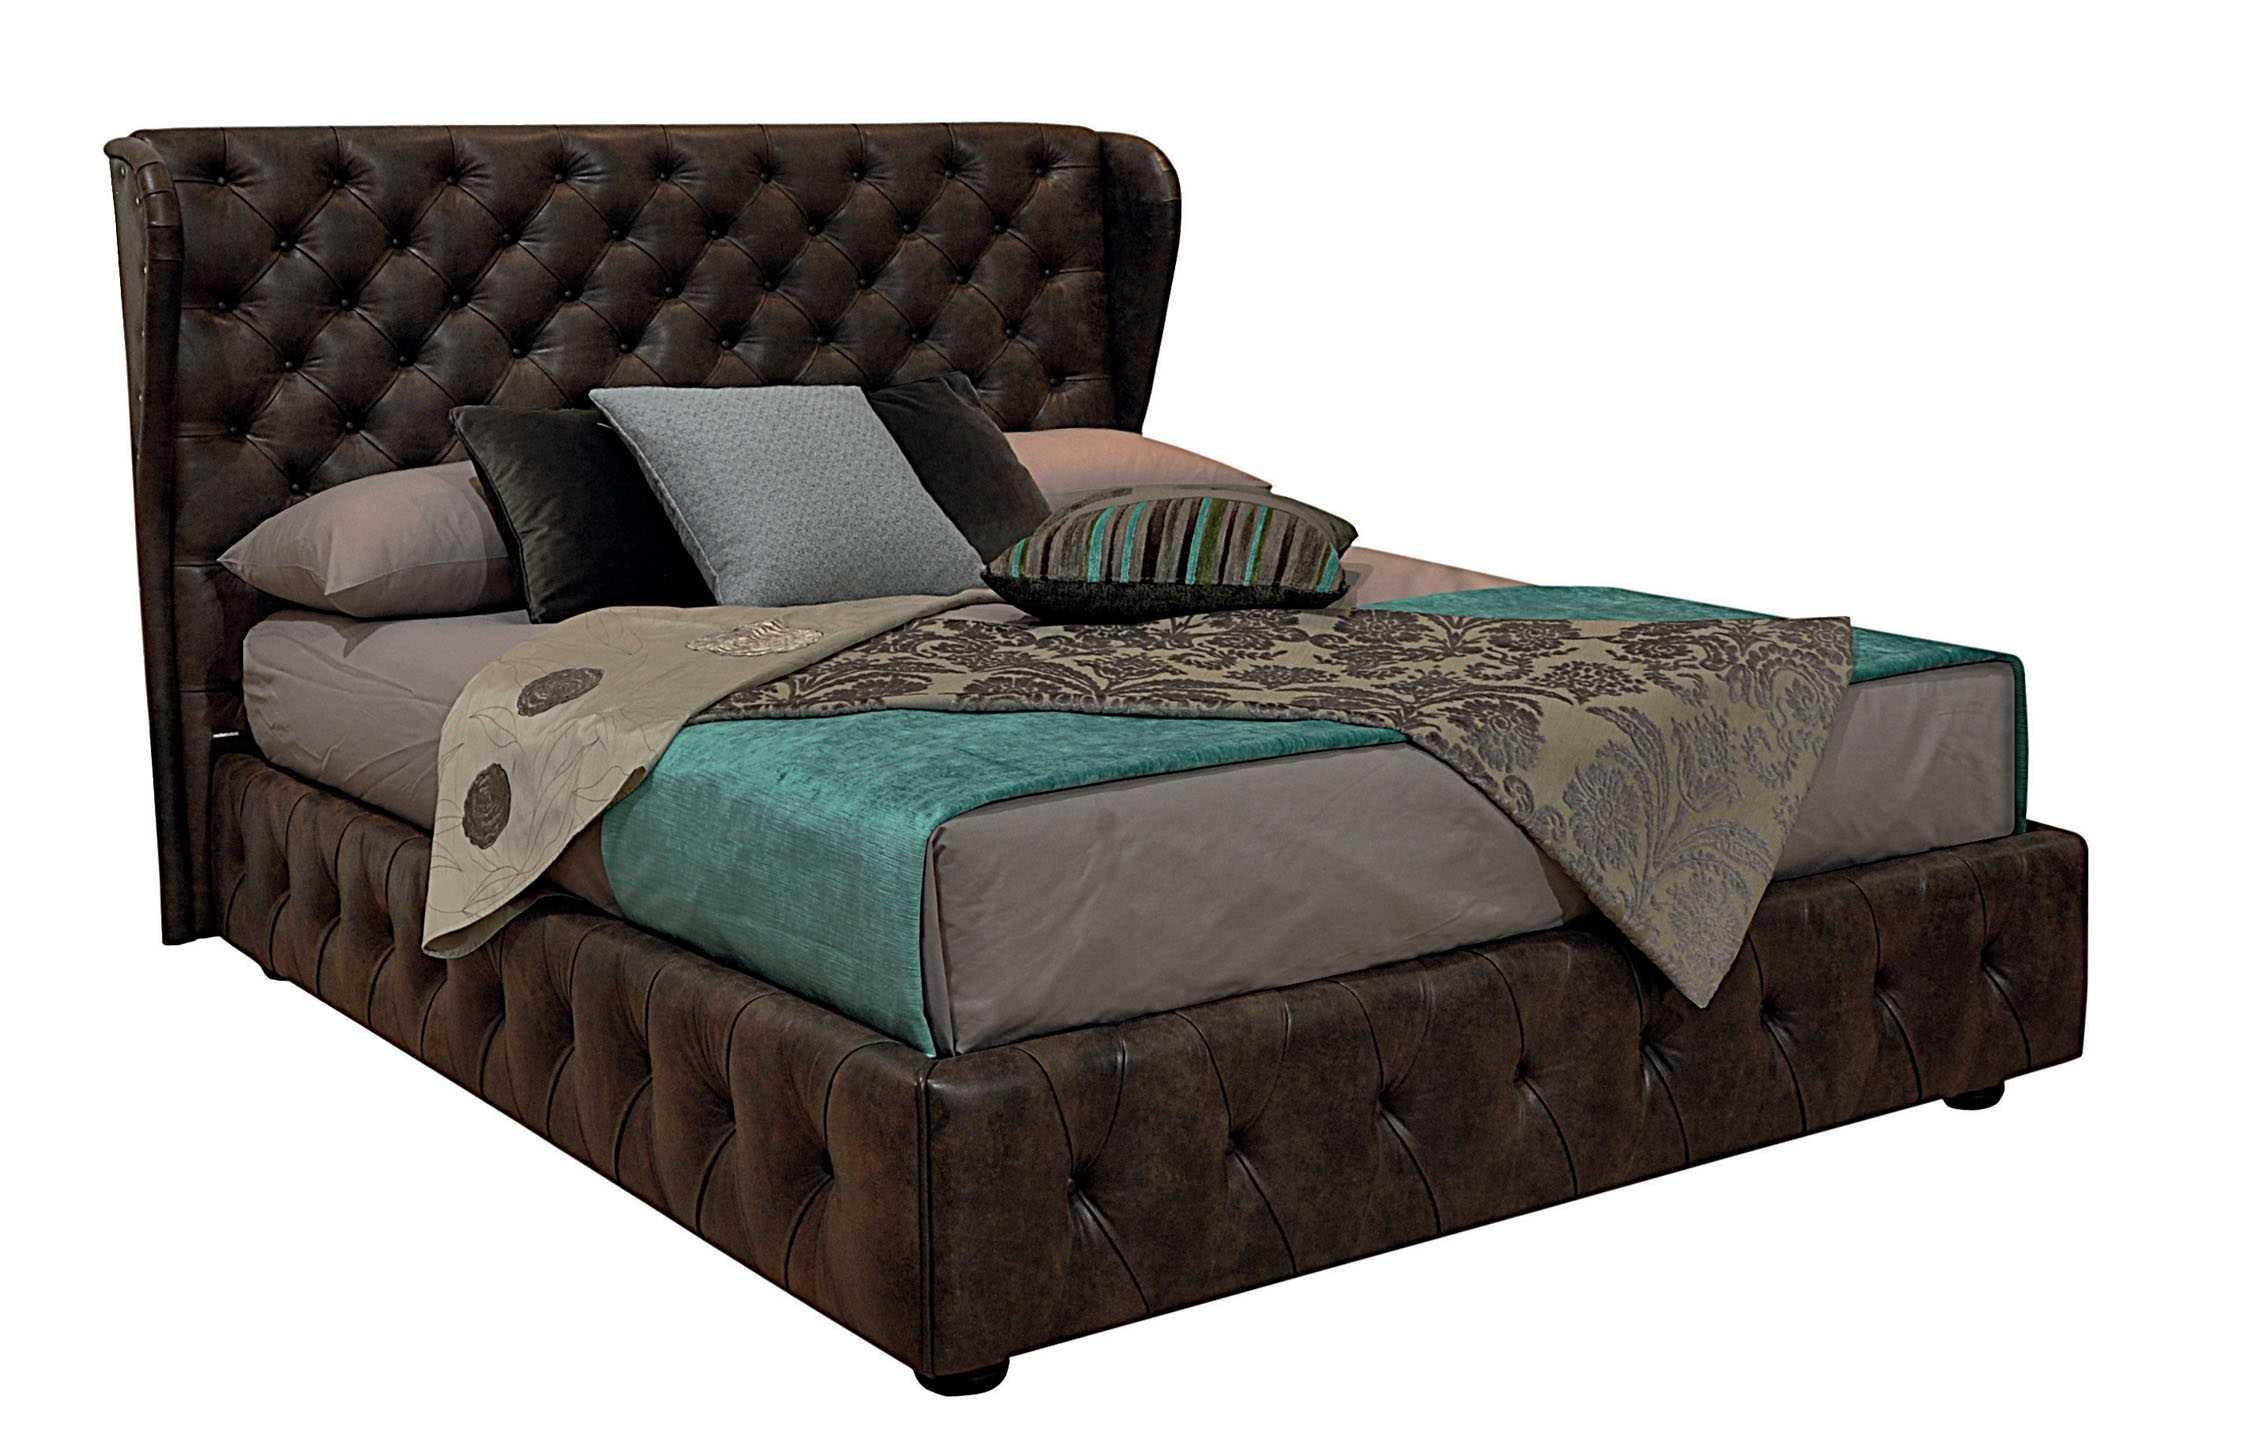 einrichtungsideen schlafzimmer betten roche bobois. Black Bedroom Furniture Sets. Home Design Ideas